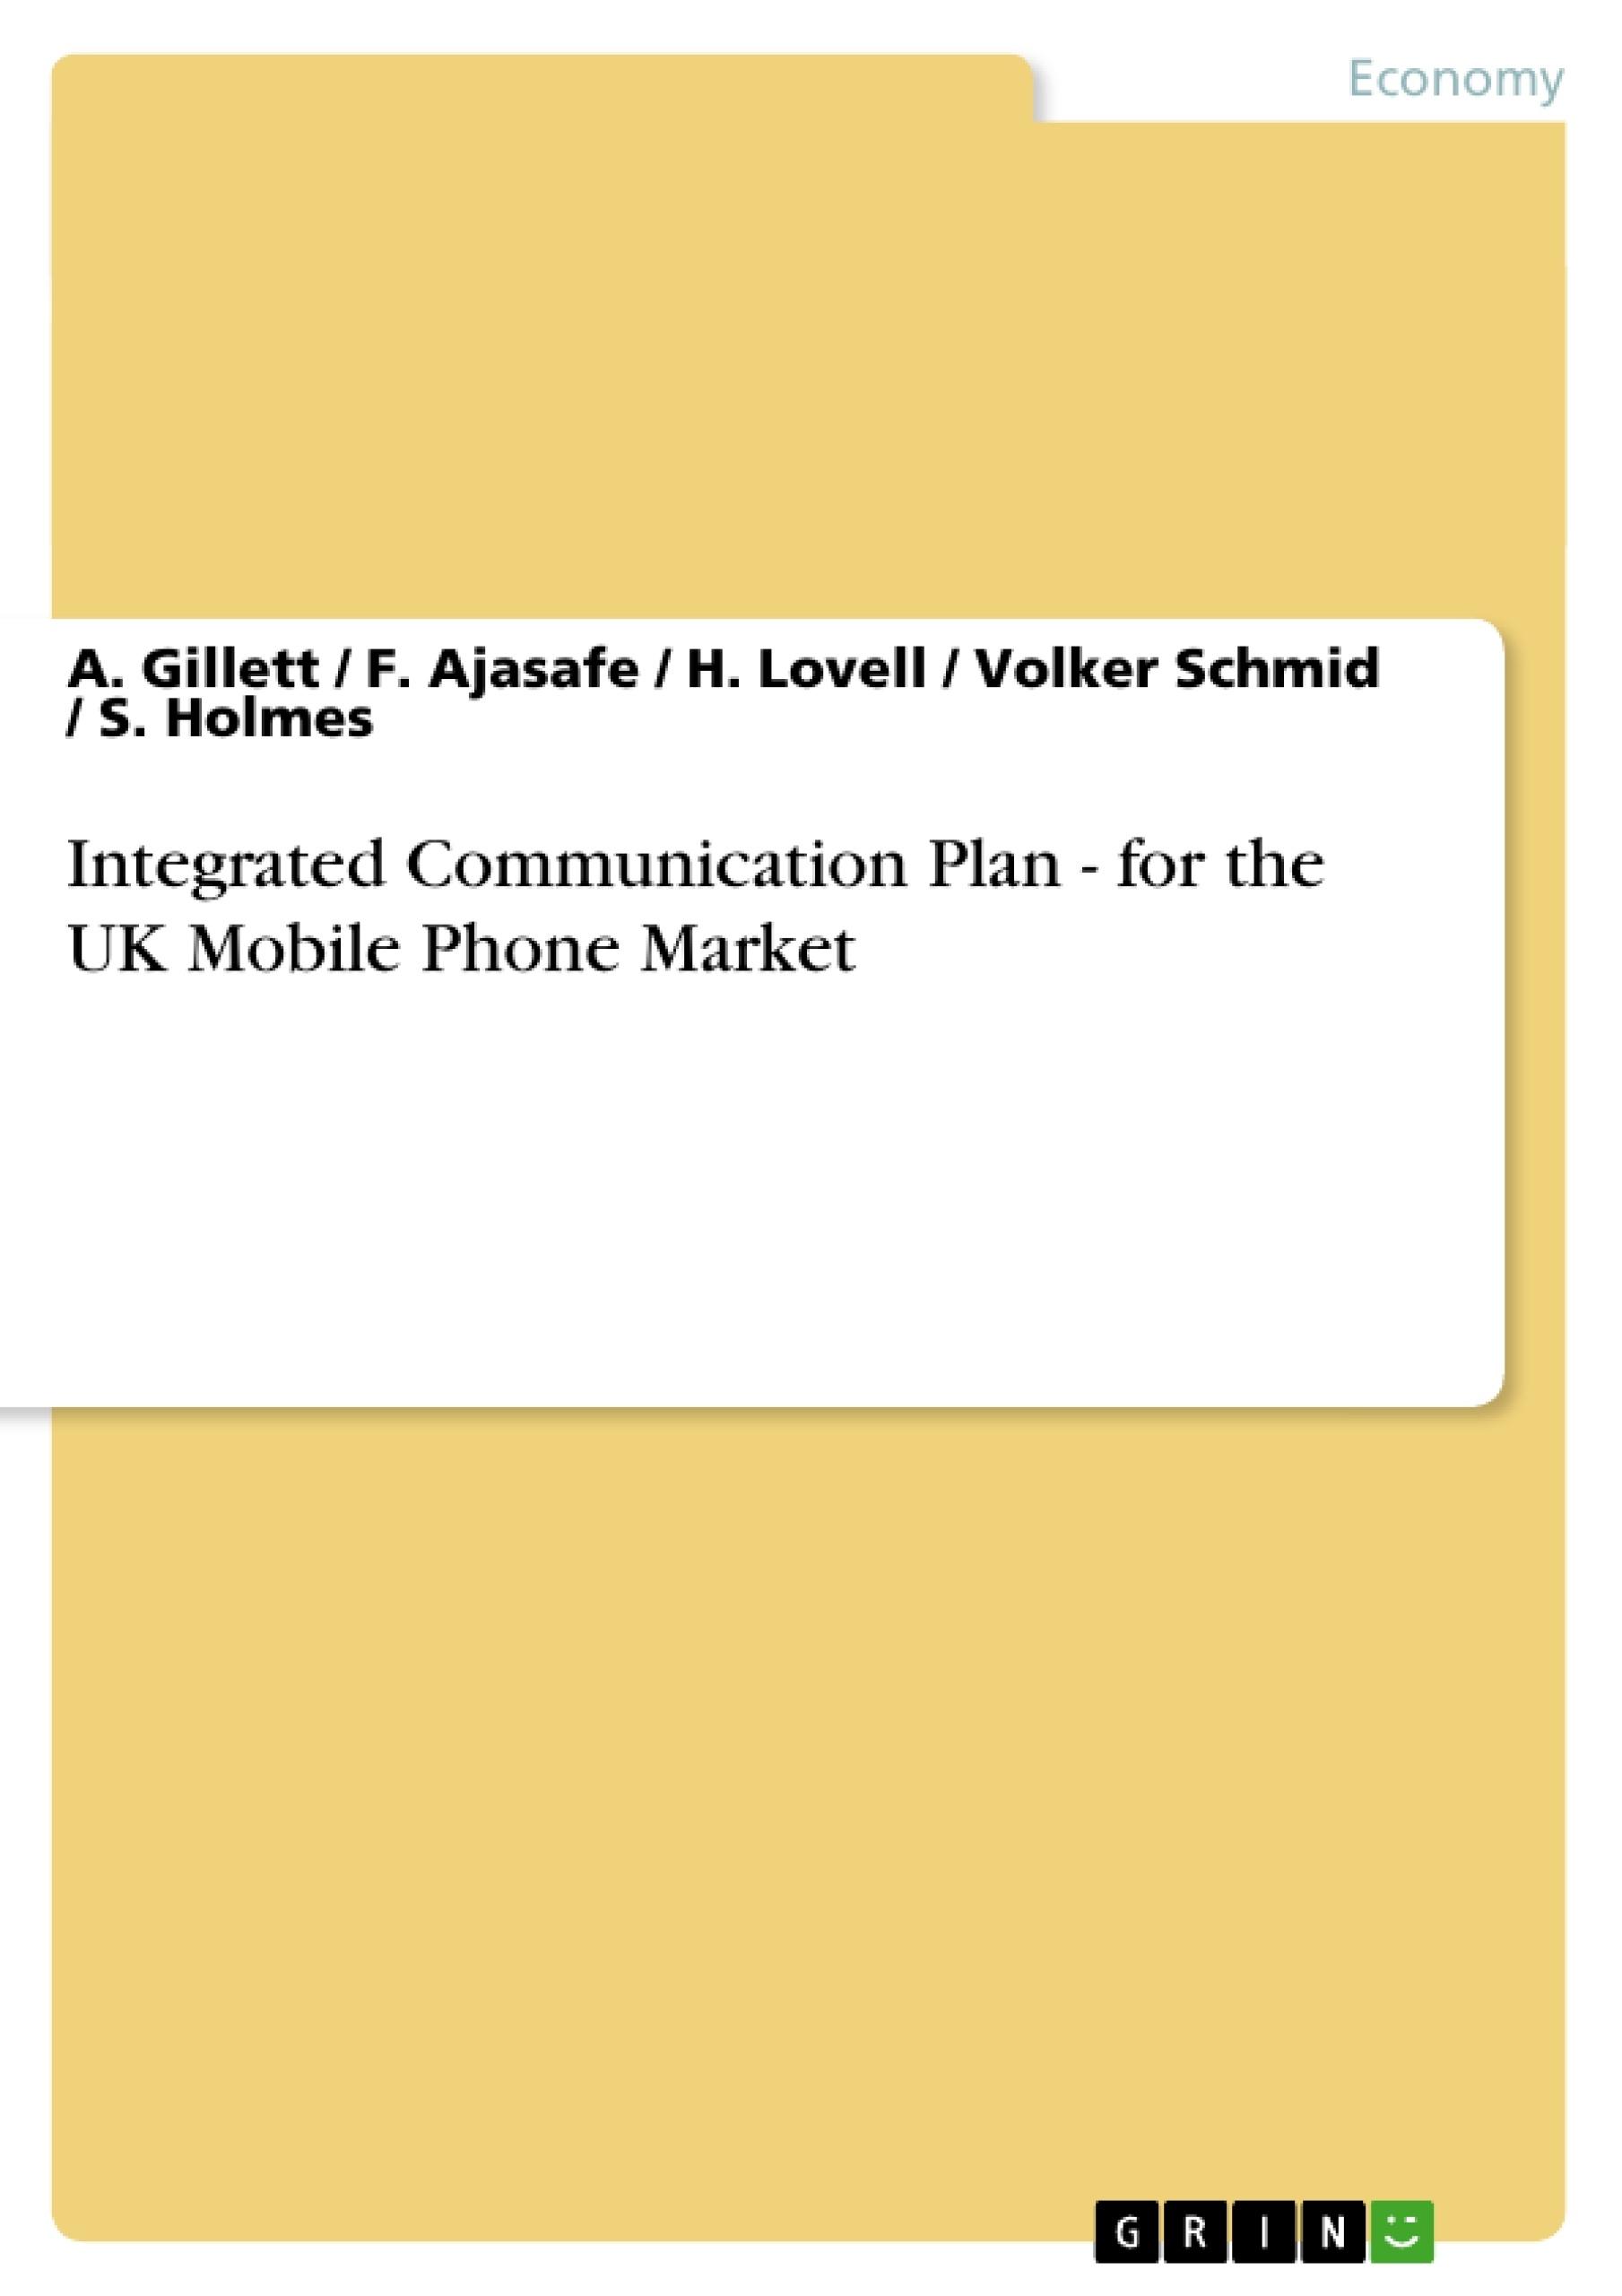 Iphone marketing plan essays